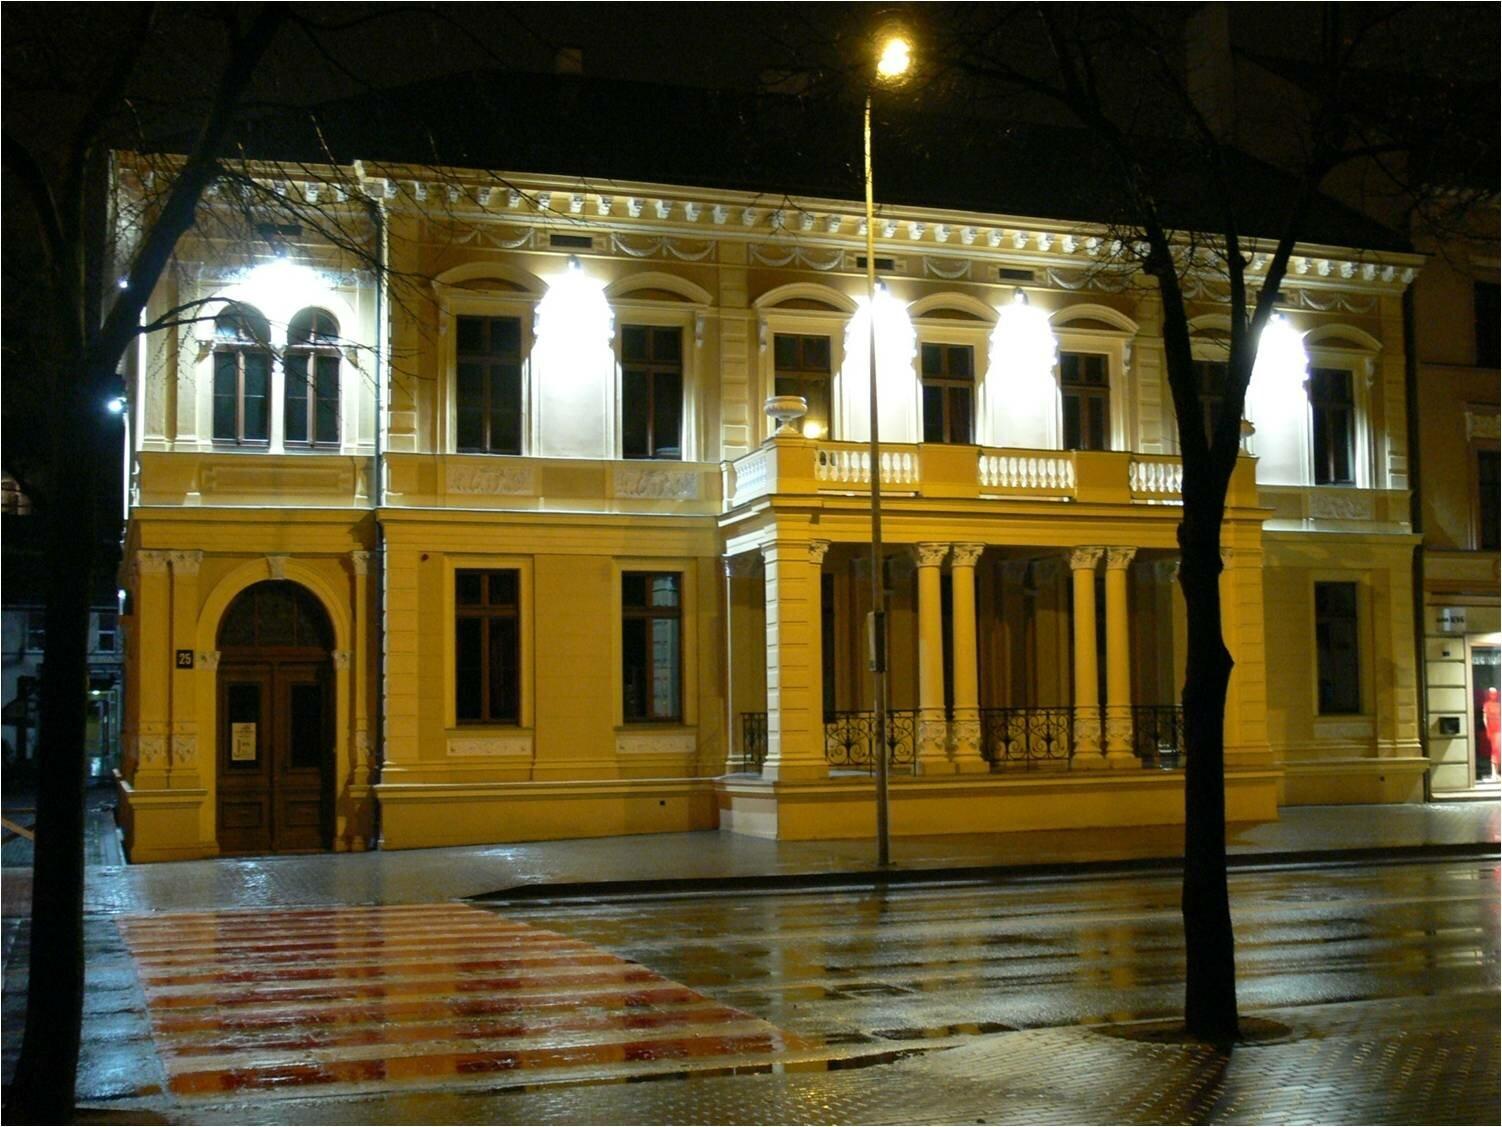 Klaipėdos apskrities viešoji I. Simonaitytės biblioteka